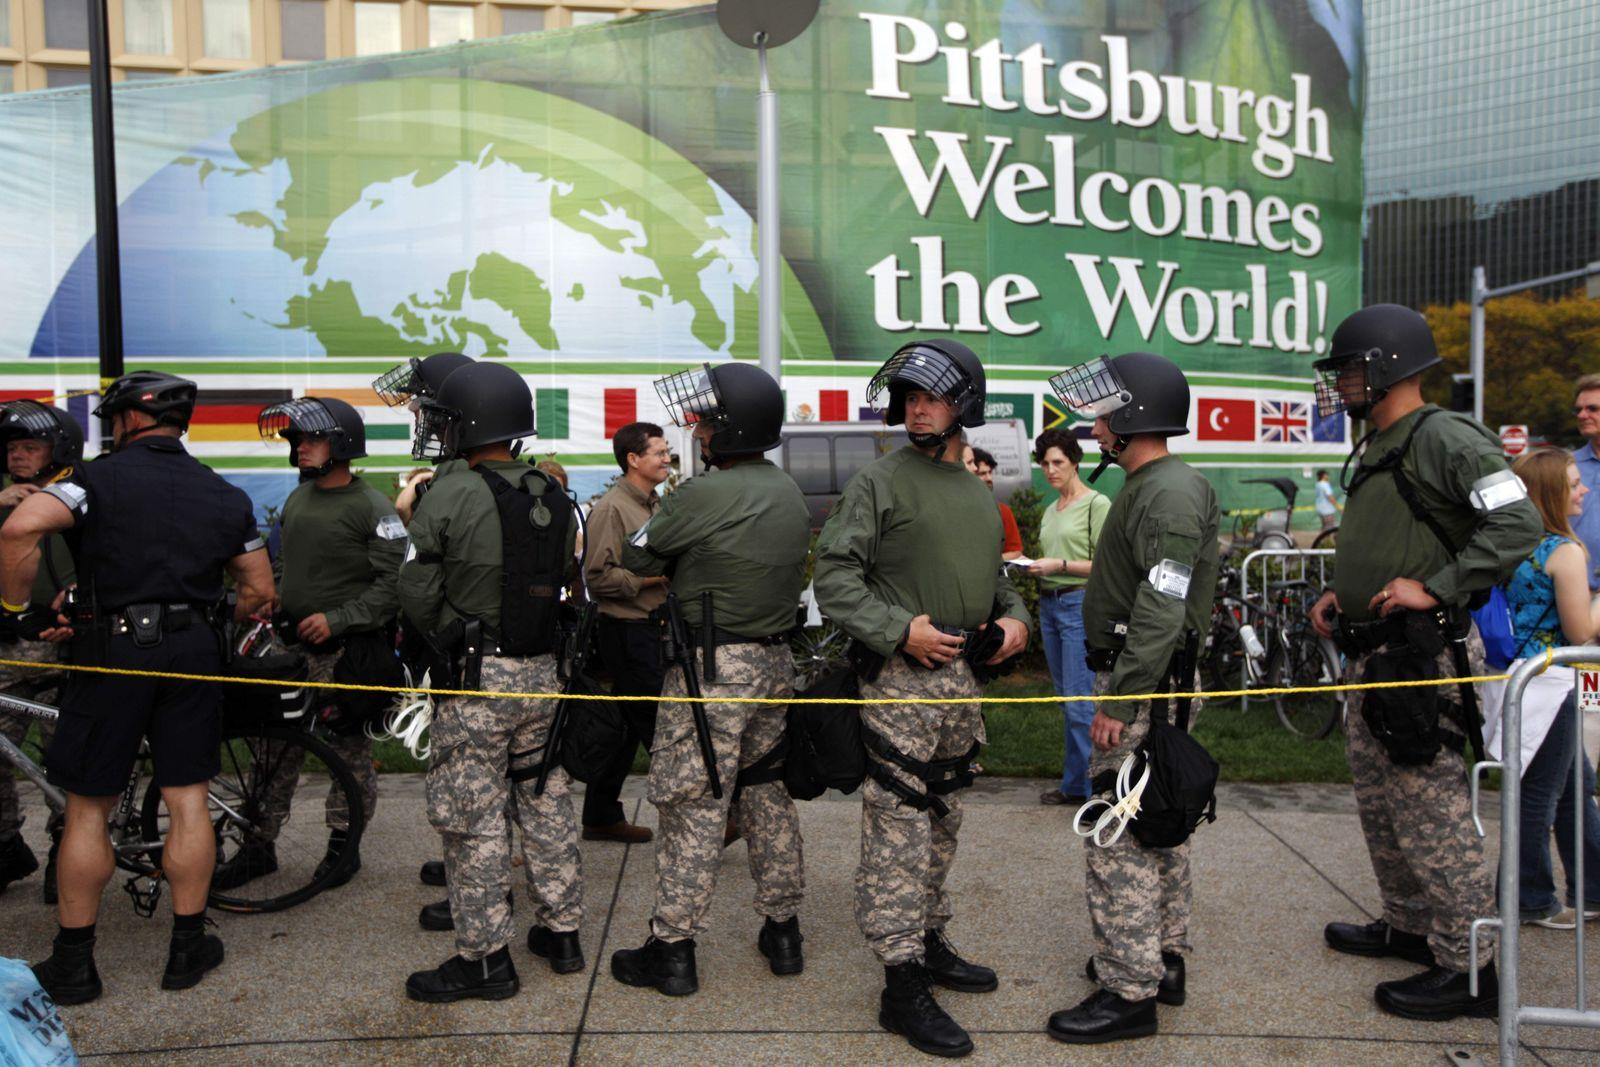 G20 Pittsburgh